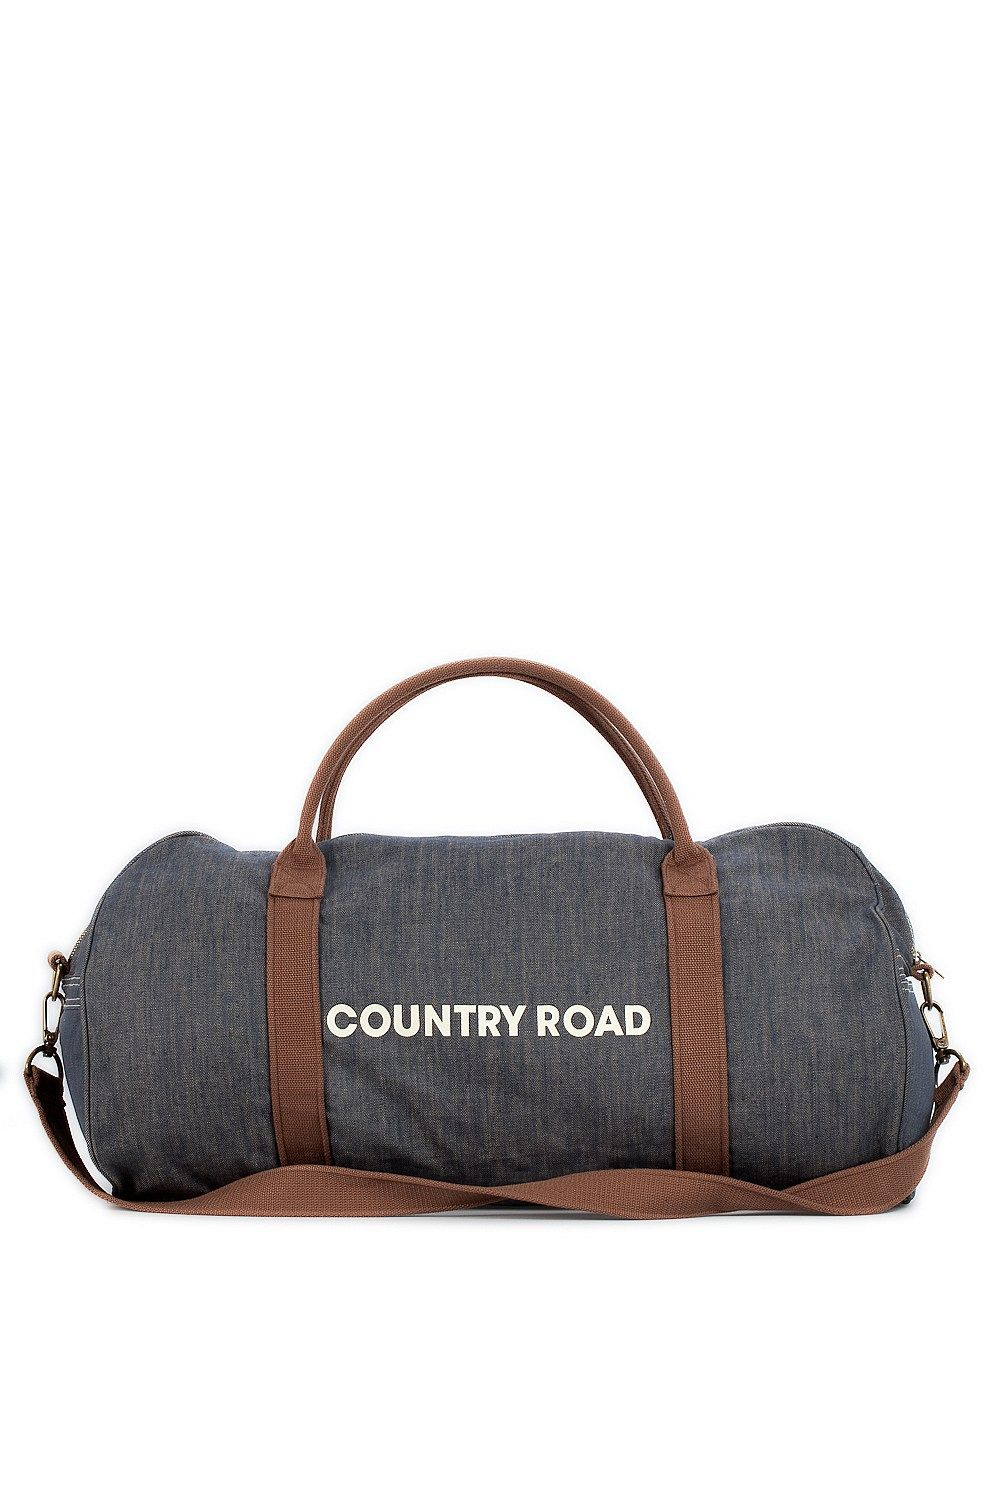 ea1802b71185 Country Road - Country Road - Men s Tote Bags Online - Raw Denim Tote